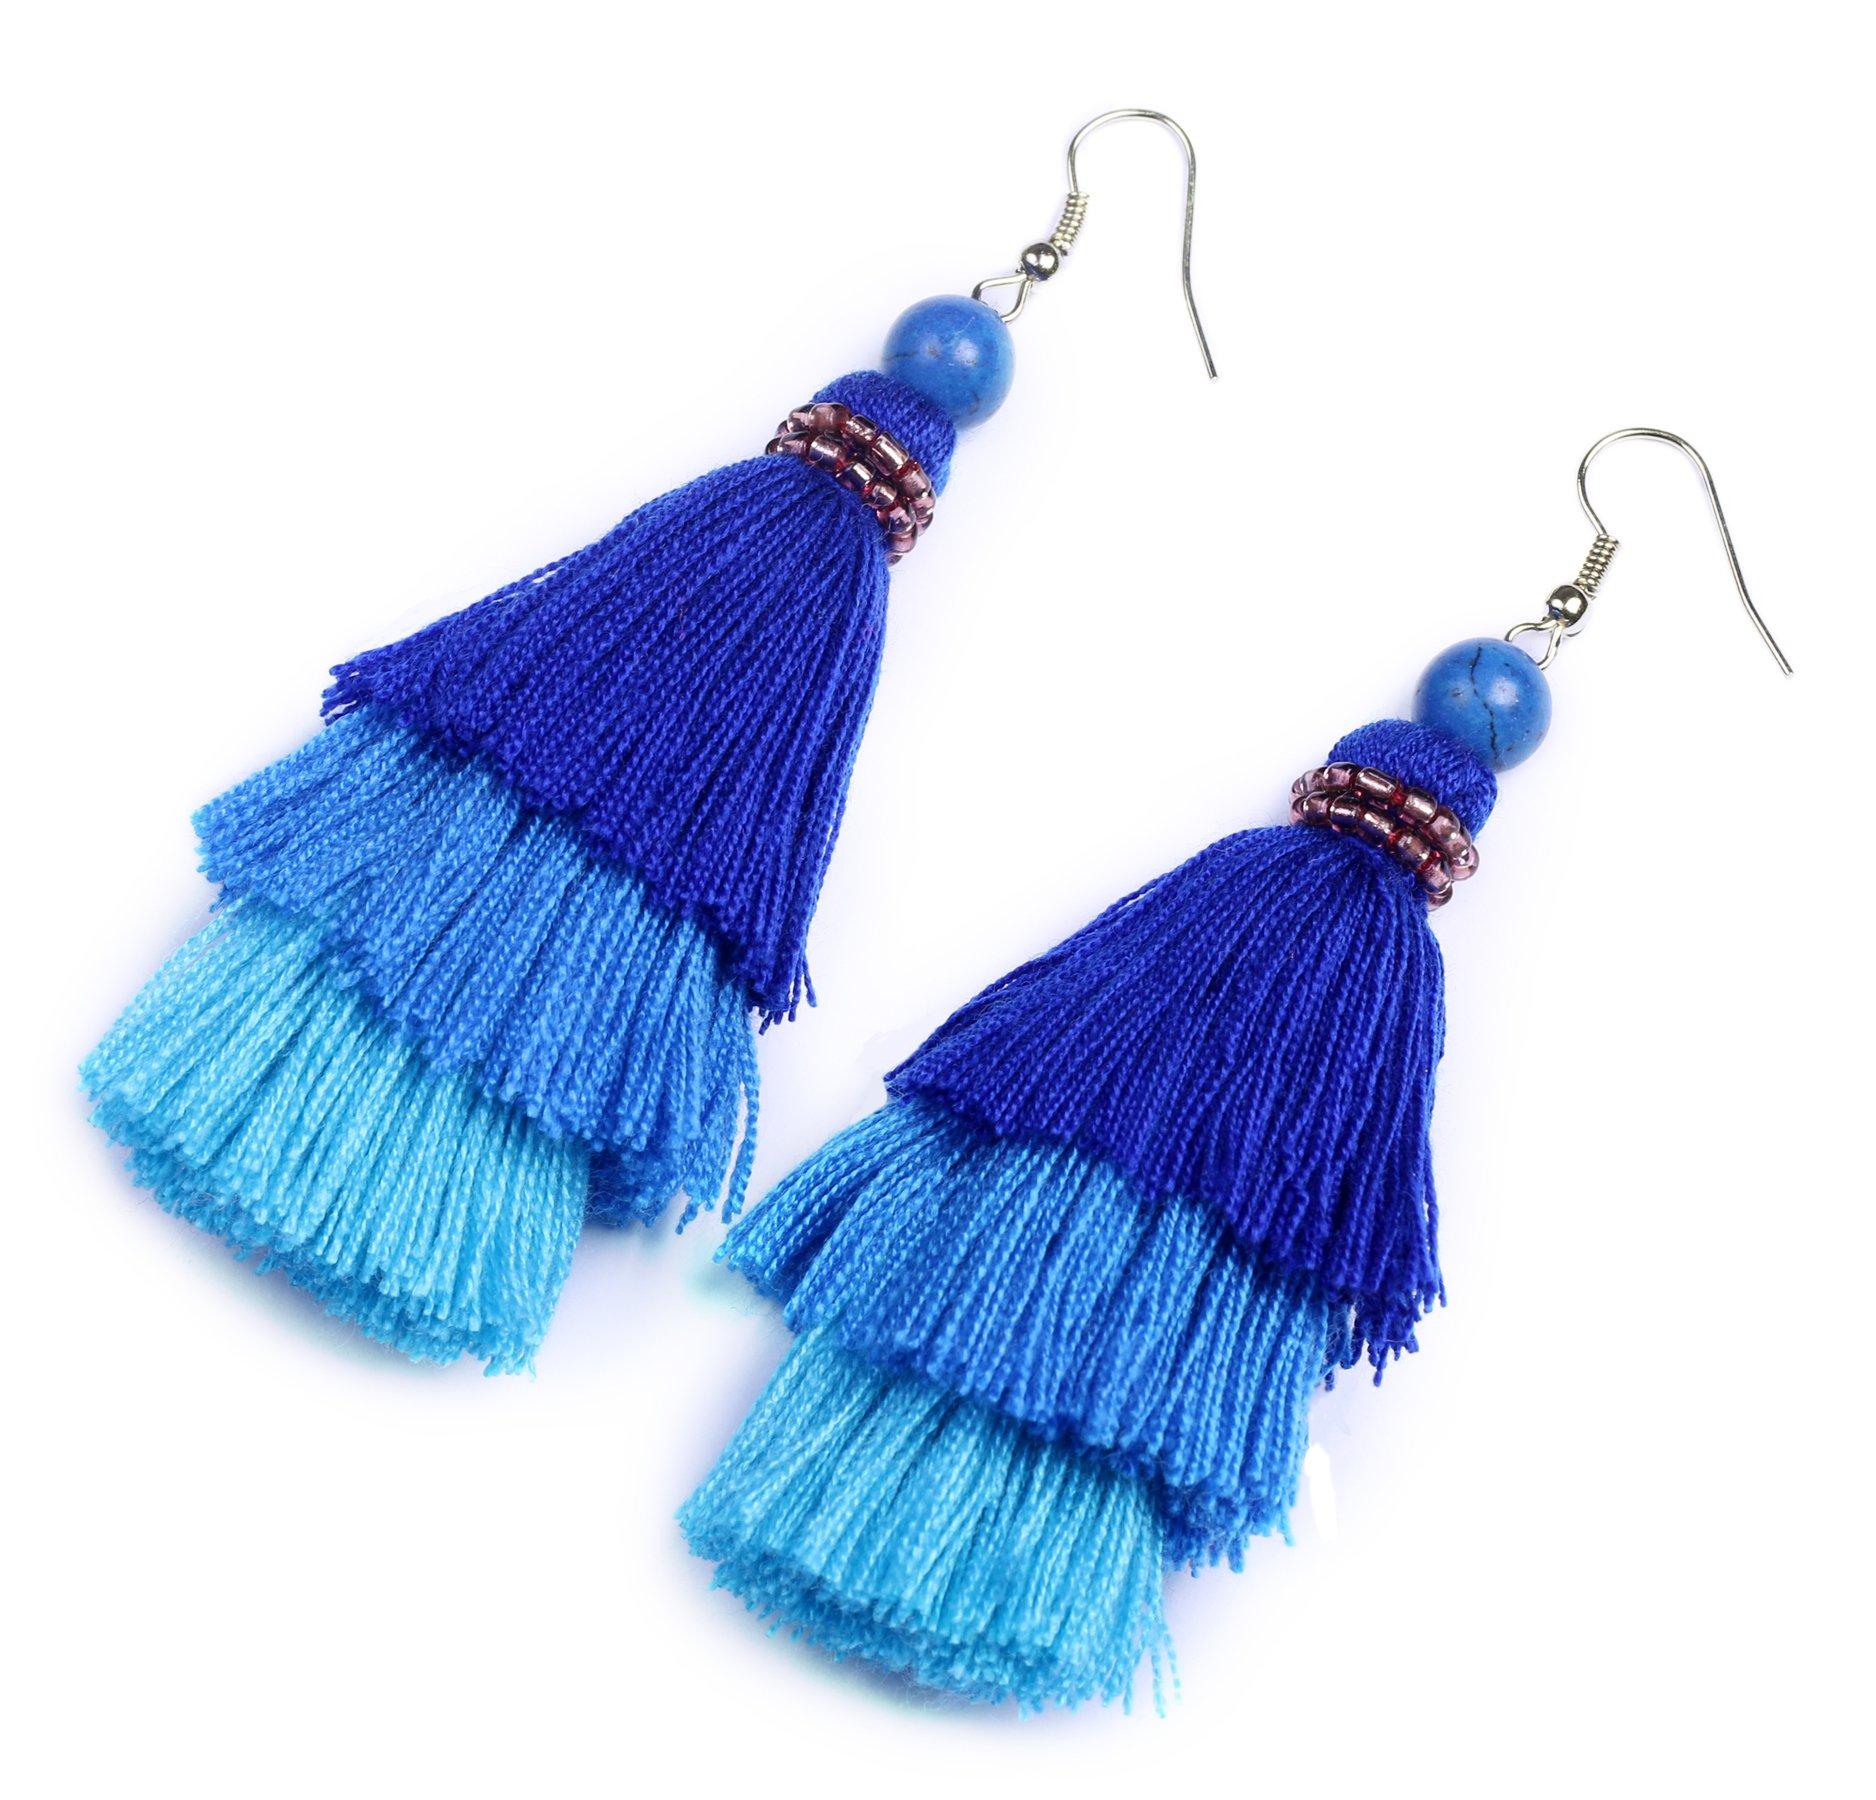 AKITAI Bohemian Jewelry Unique Ideas Blue Layered Tassel Earrings Boho Ethnic Handmade Gypsy Style